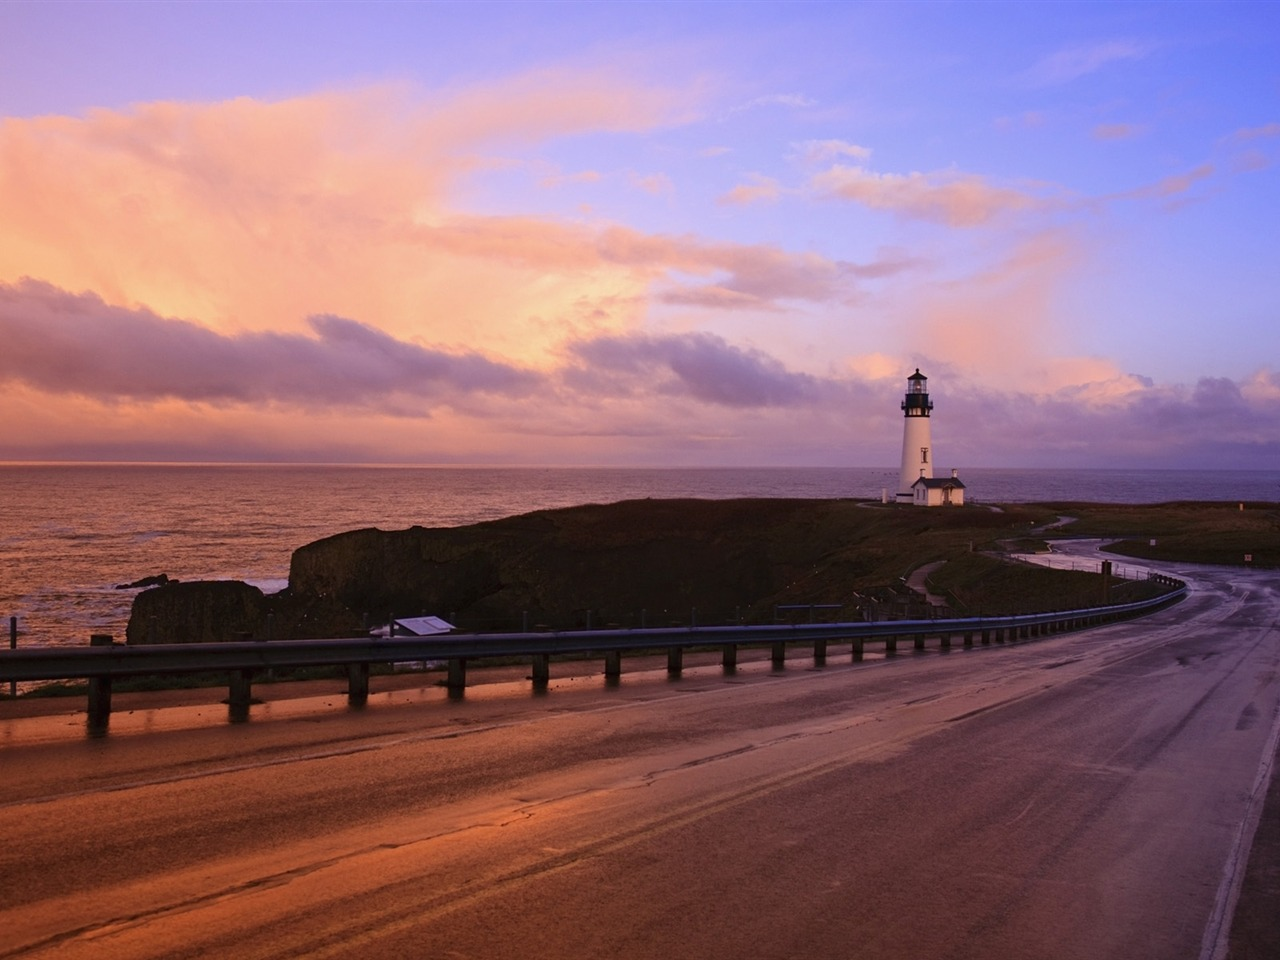 oregon coast highway et le phare fond d u0026 39  u00e9cran aper u00e7u